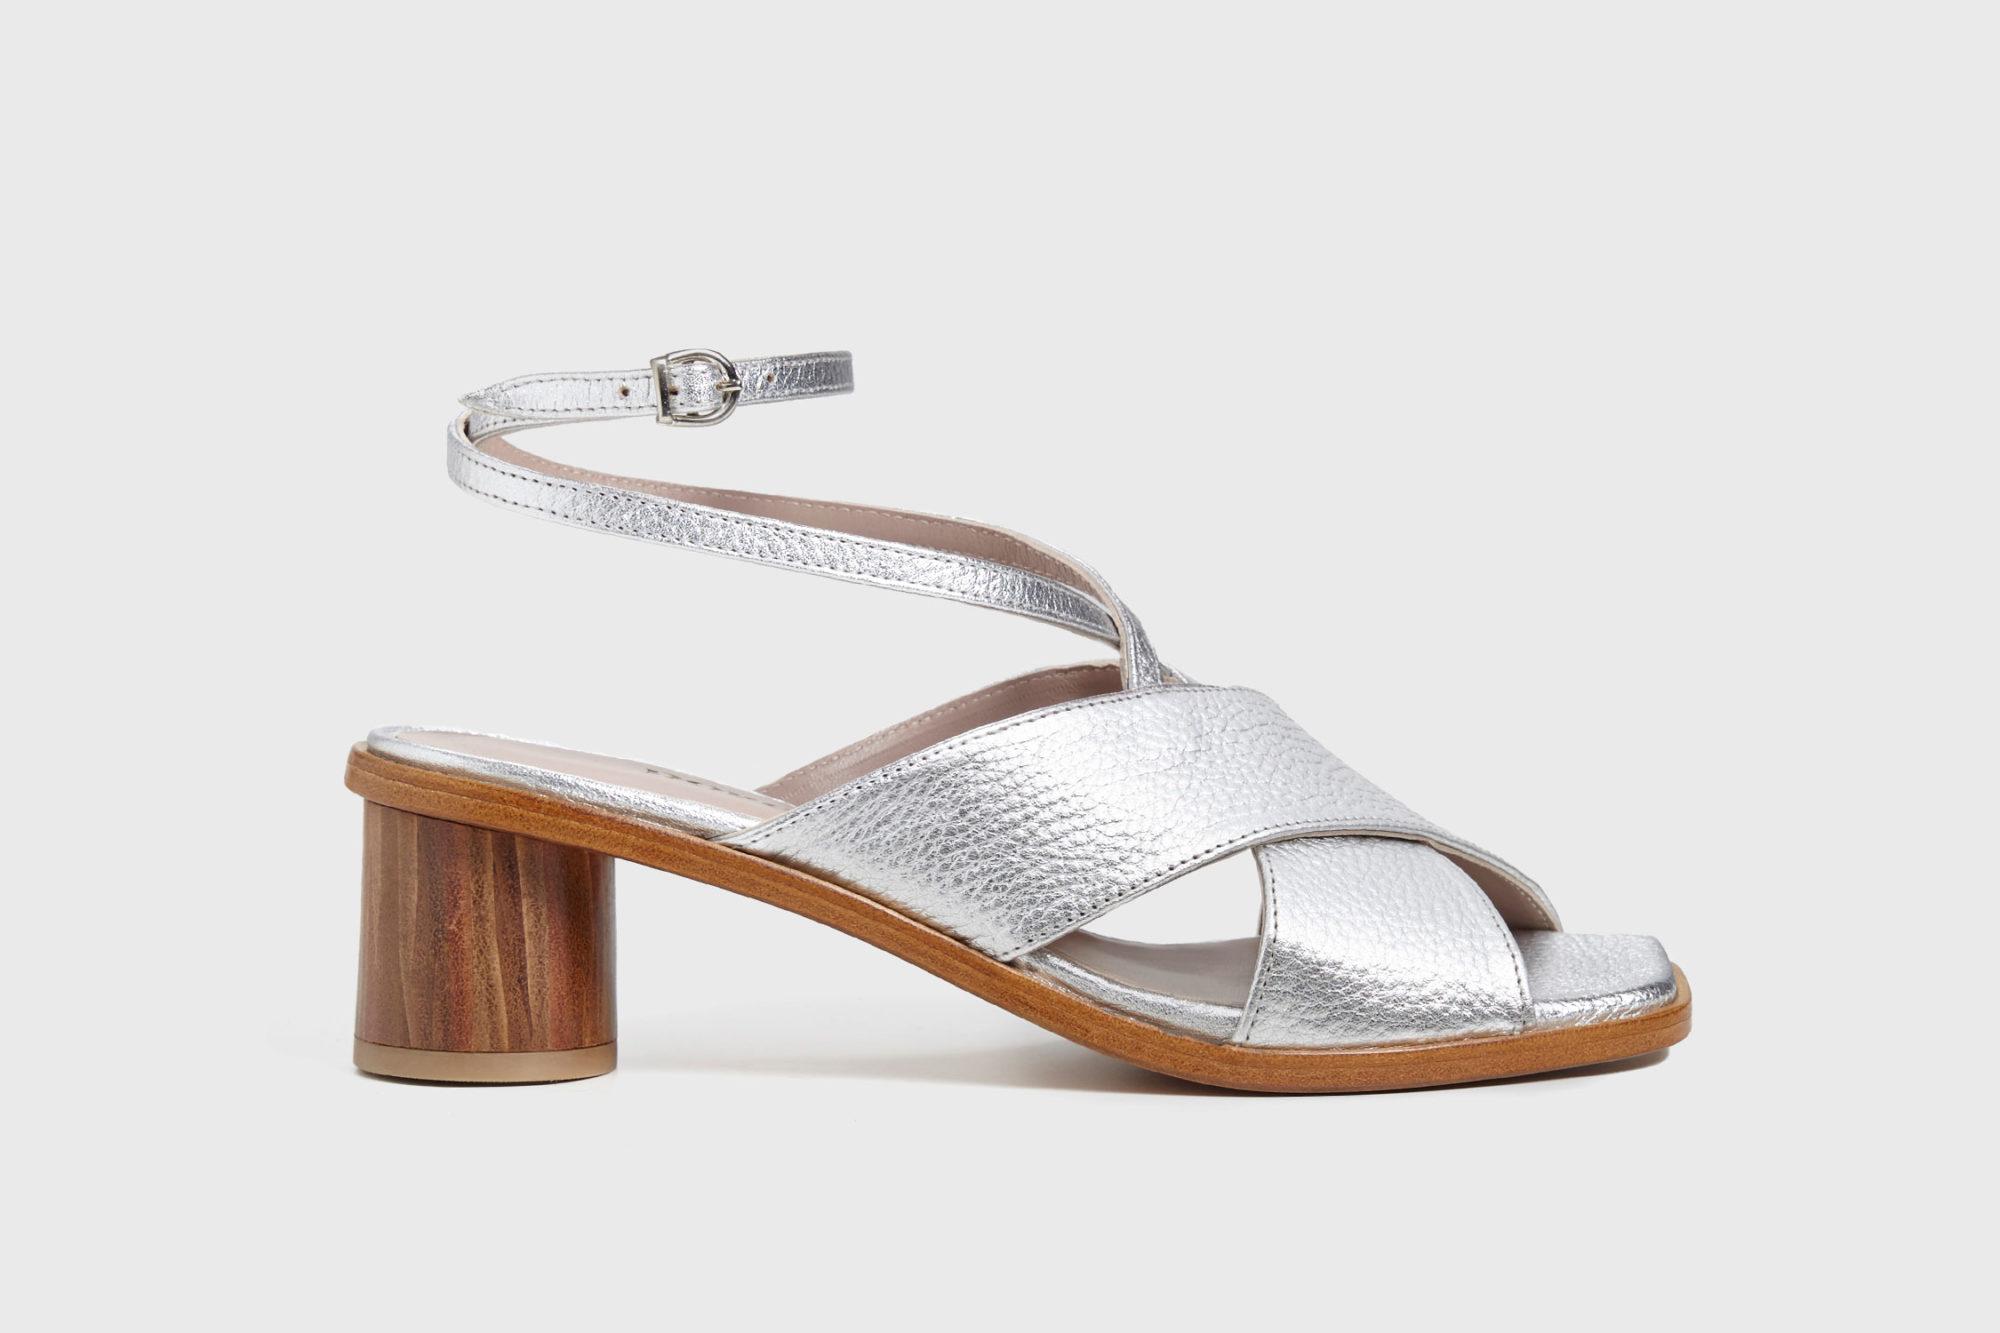 Sandalia de tacón medio Daphne ss17 perfil